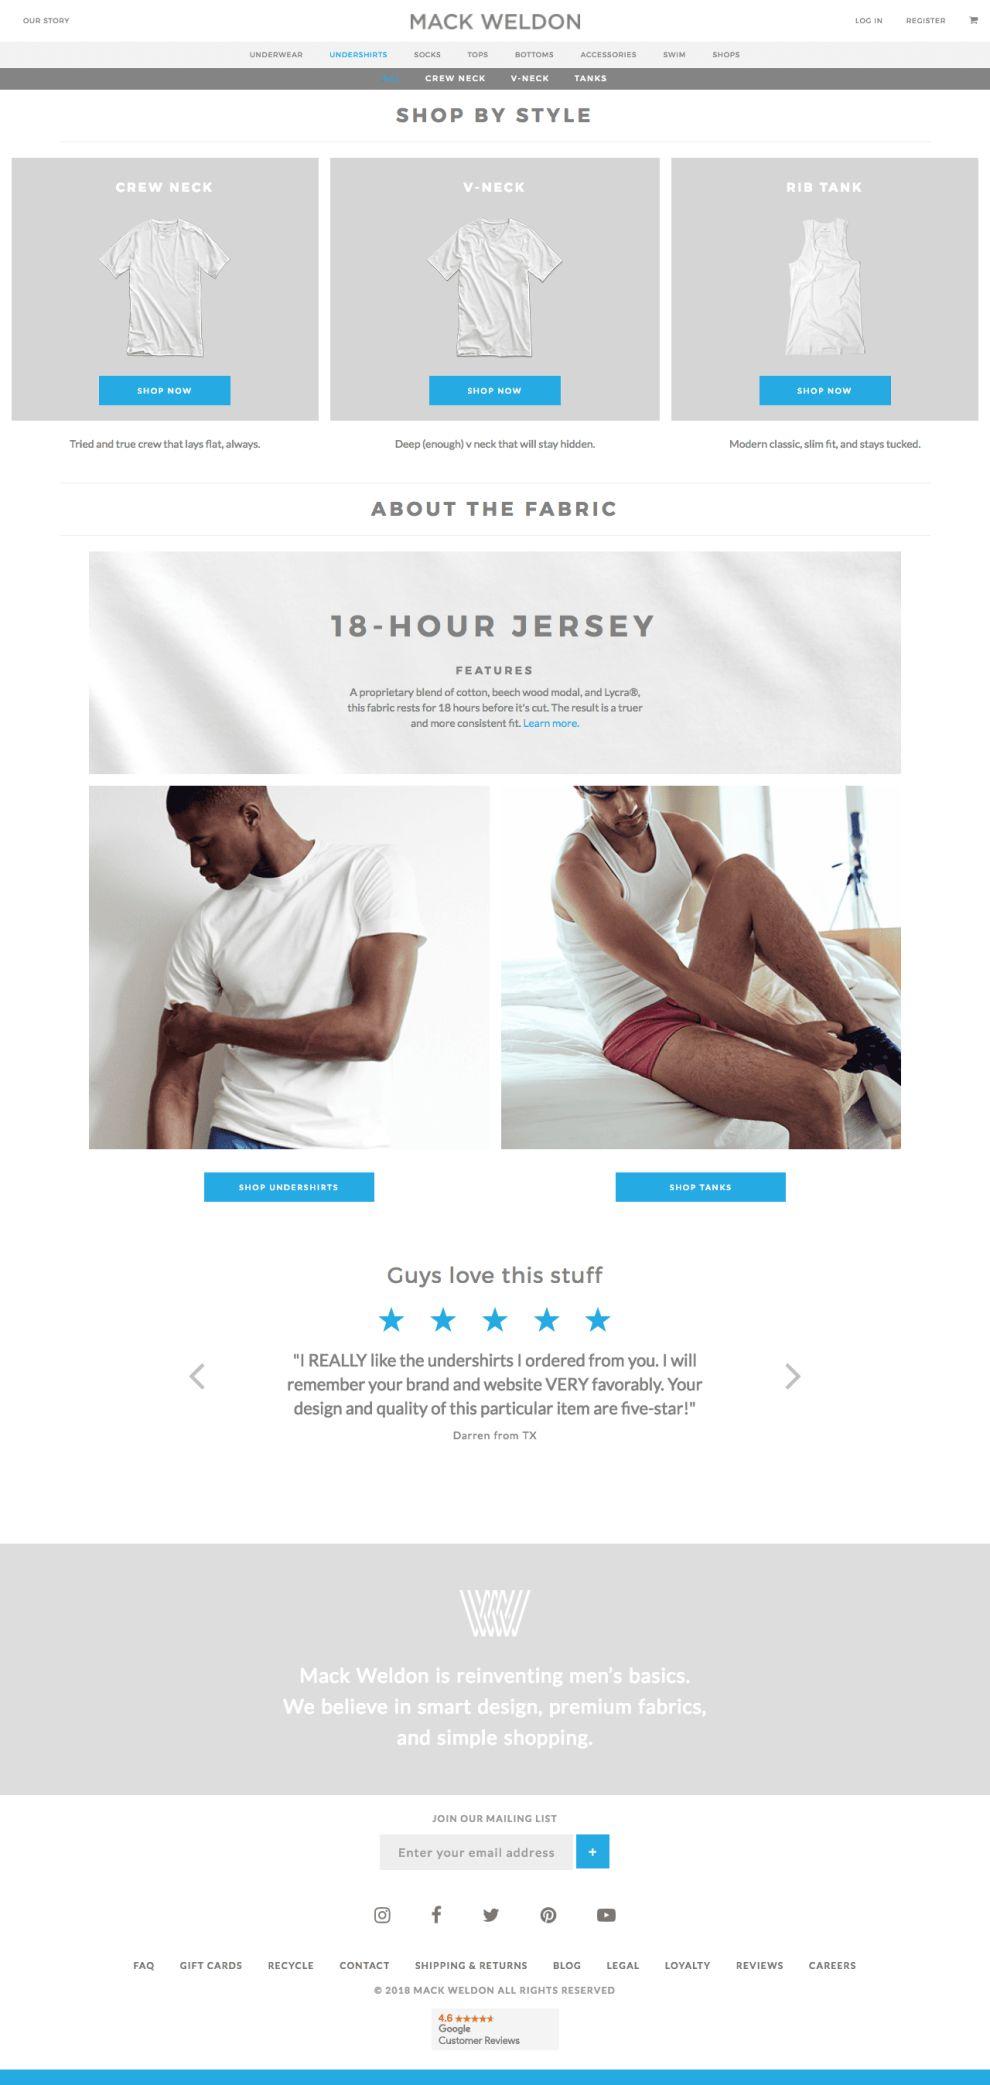 Mack Weldon Website Design Product Page